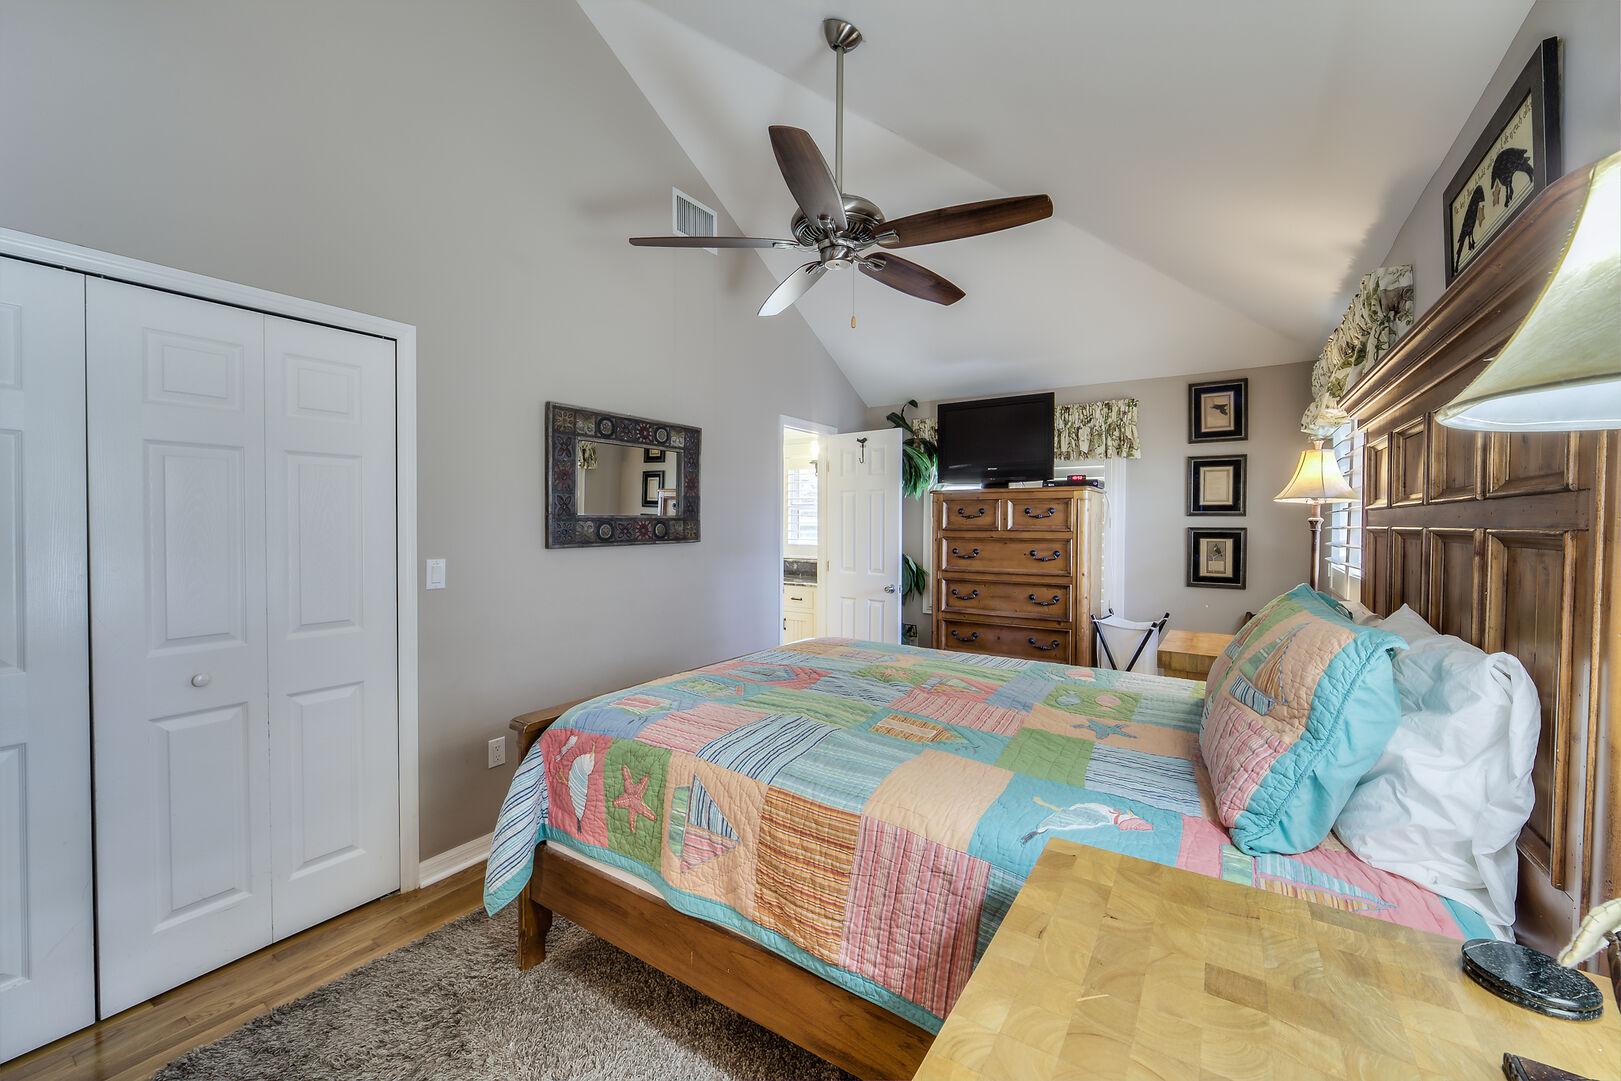 Crows Nest Bedroom Fort Myers Beach Rental